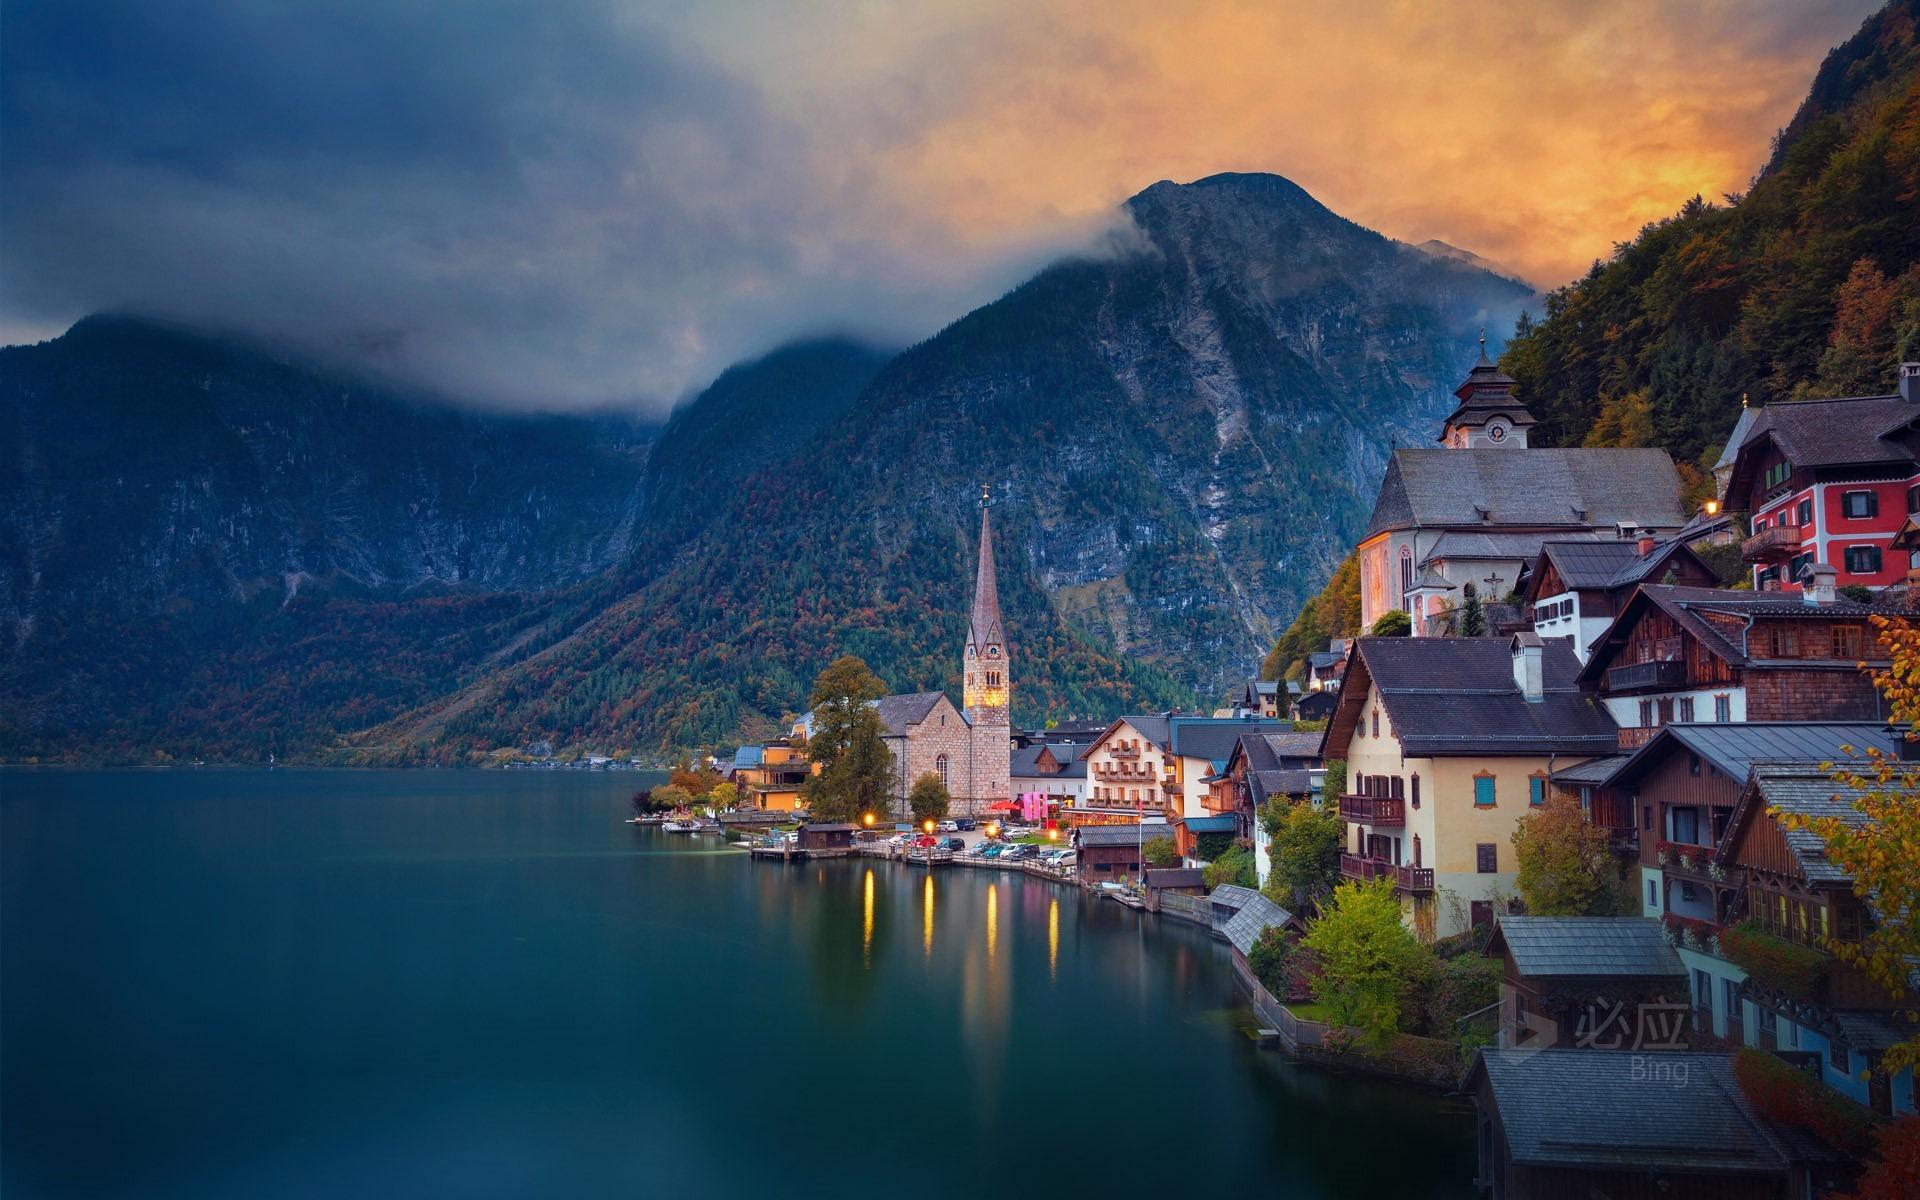 Hallstatt Austria 2017 Bing Wallpaper Preview